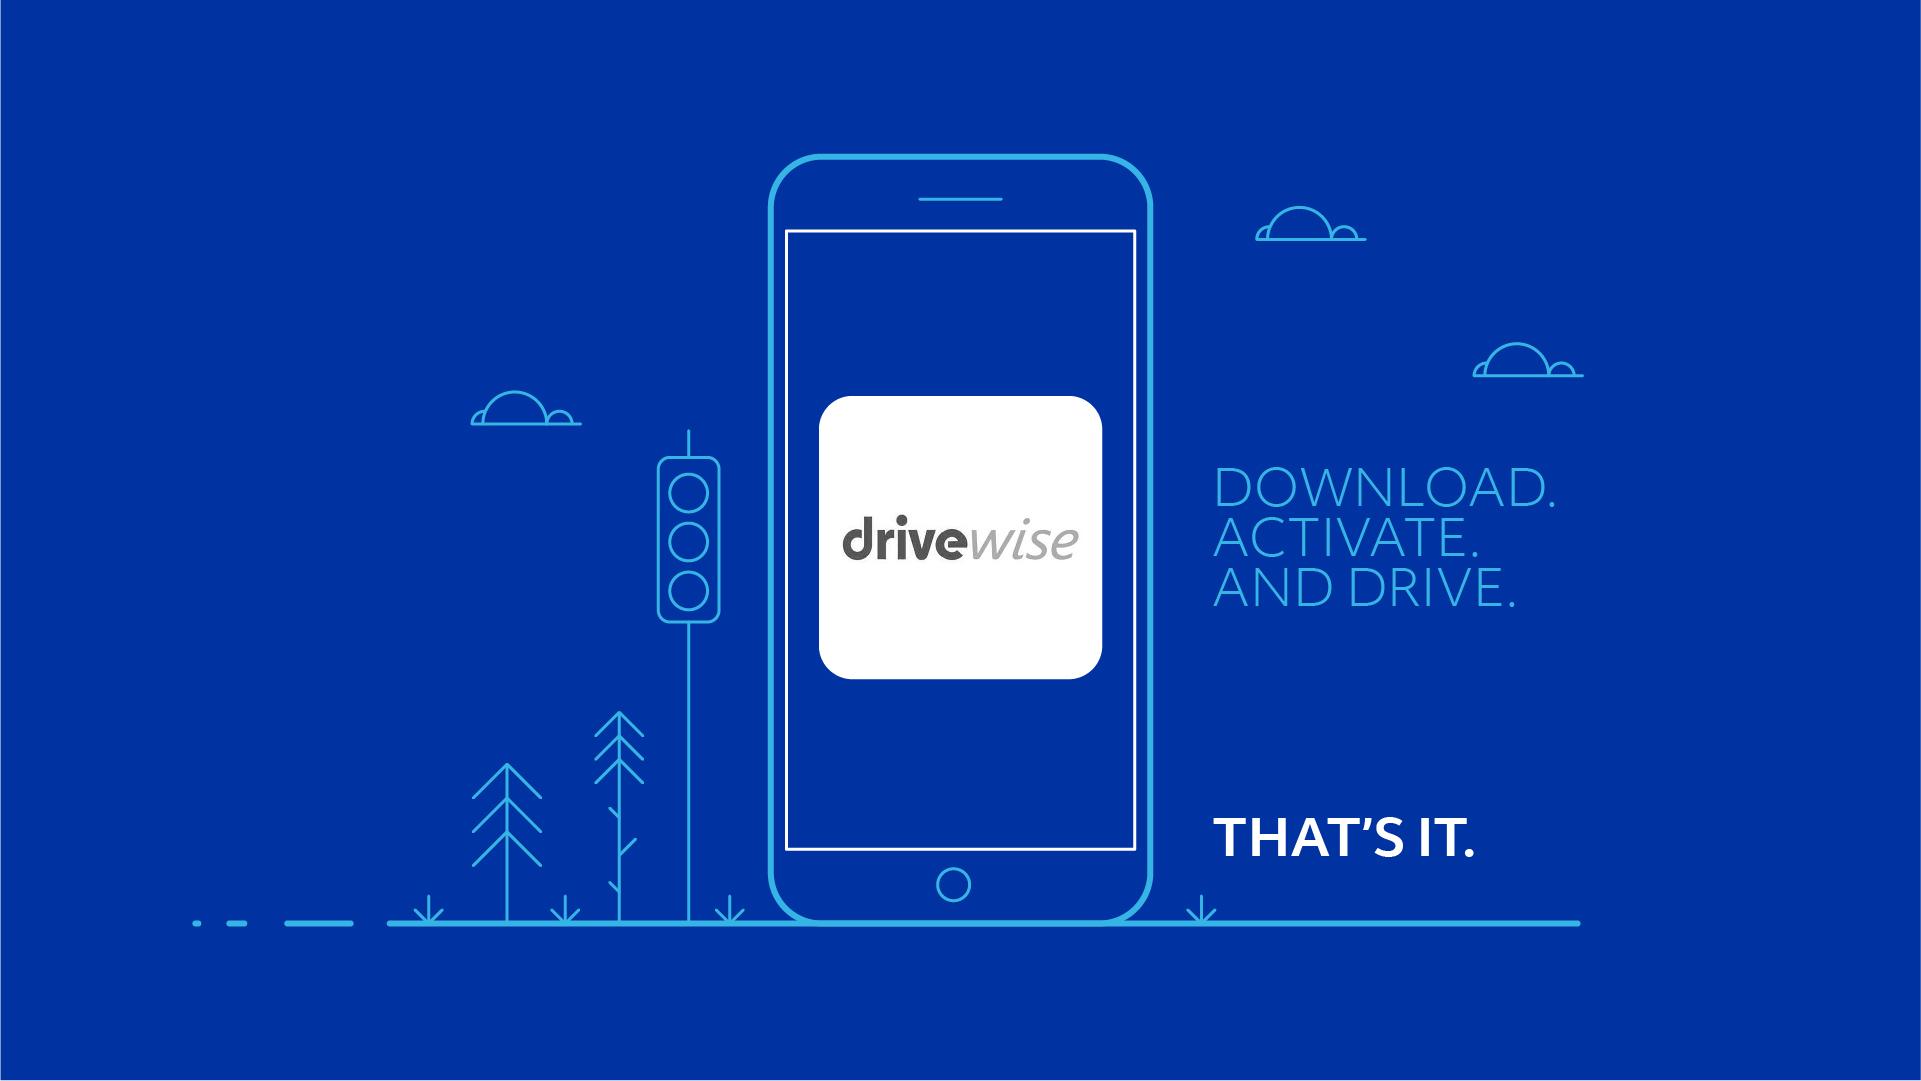 CAR-180410_ALLSTATE_DRIVEWISE_PITCH_REVISIONS_cv_v04-08.jpg